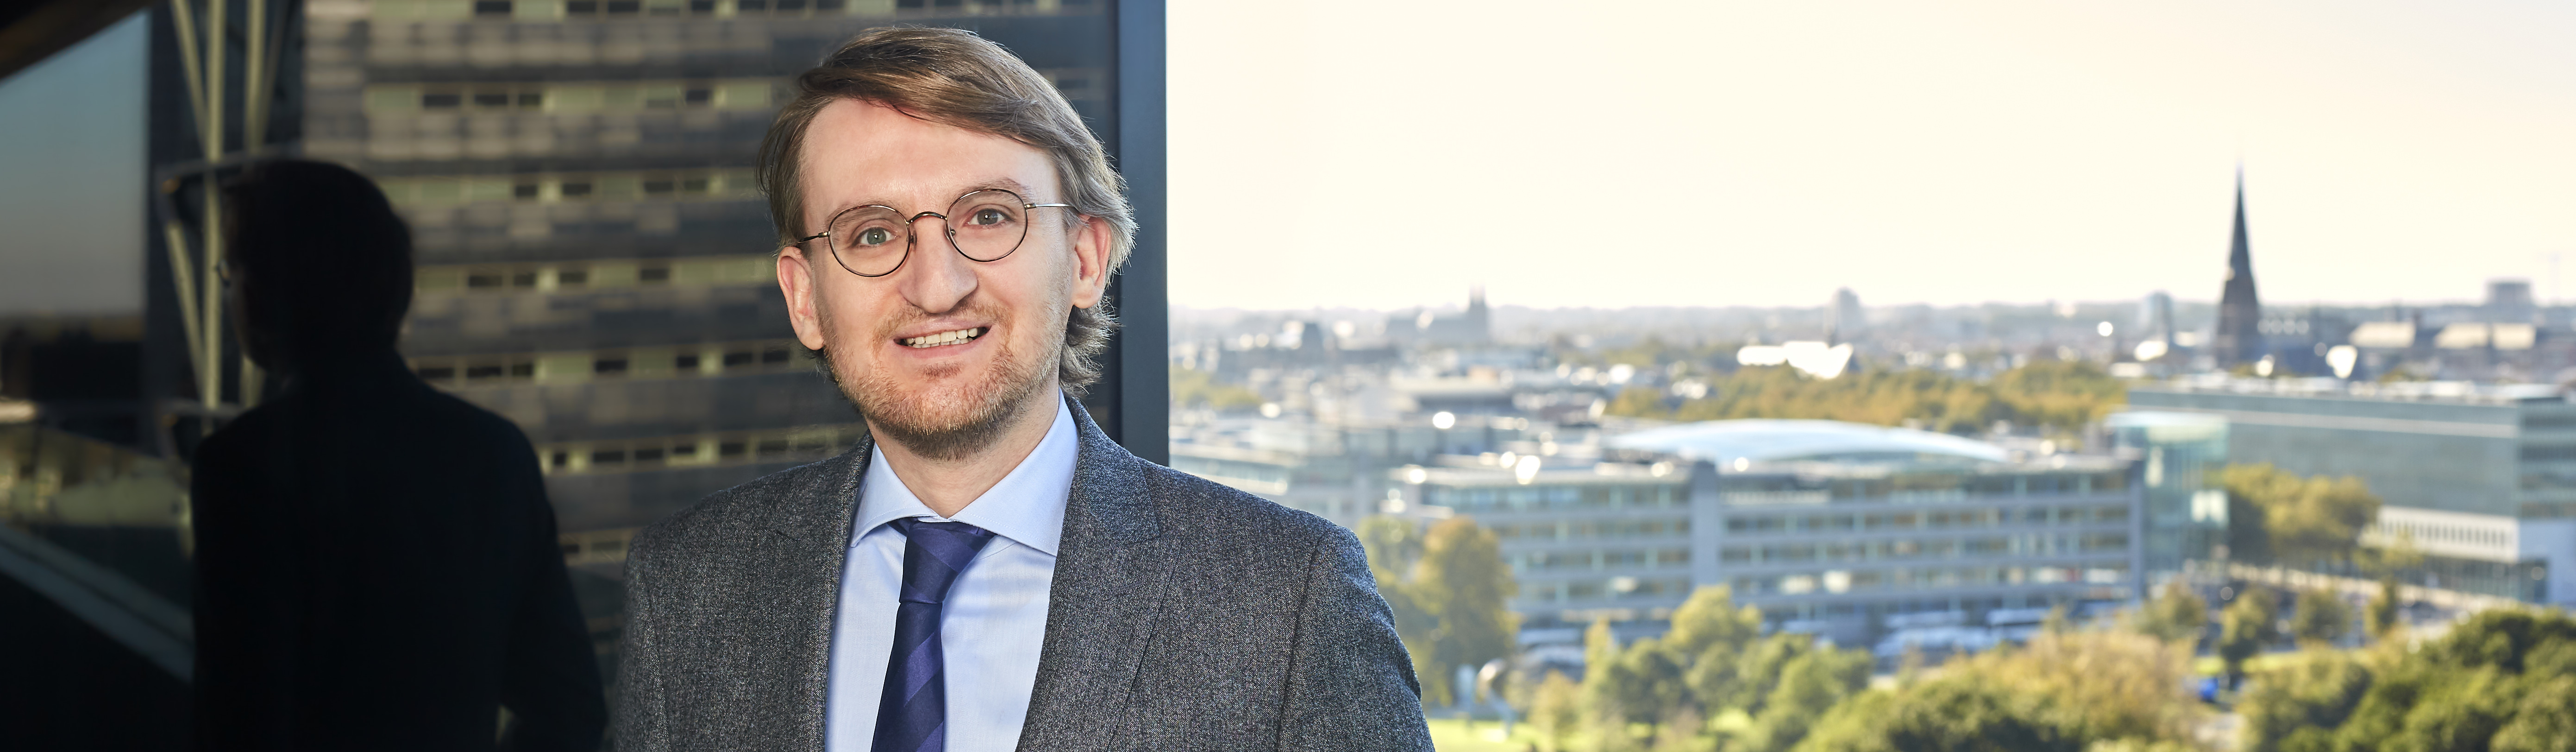 Bram Martin, PSL Pels Rijcken